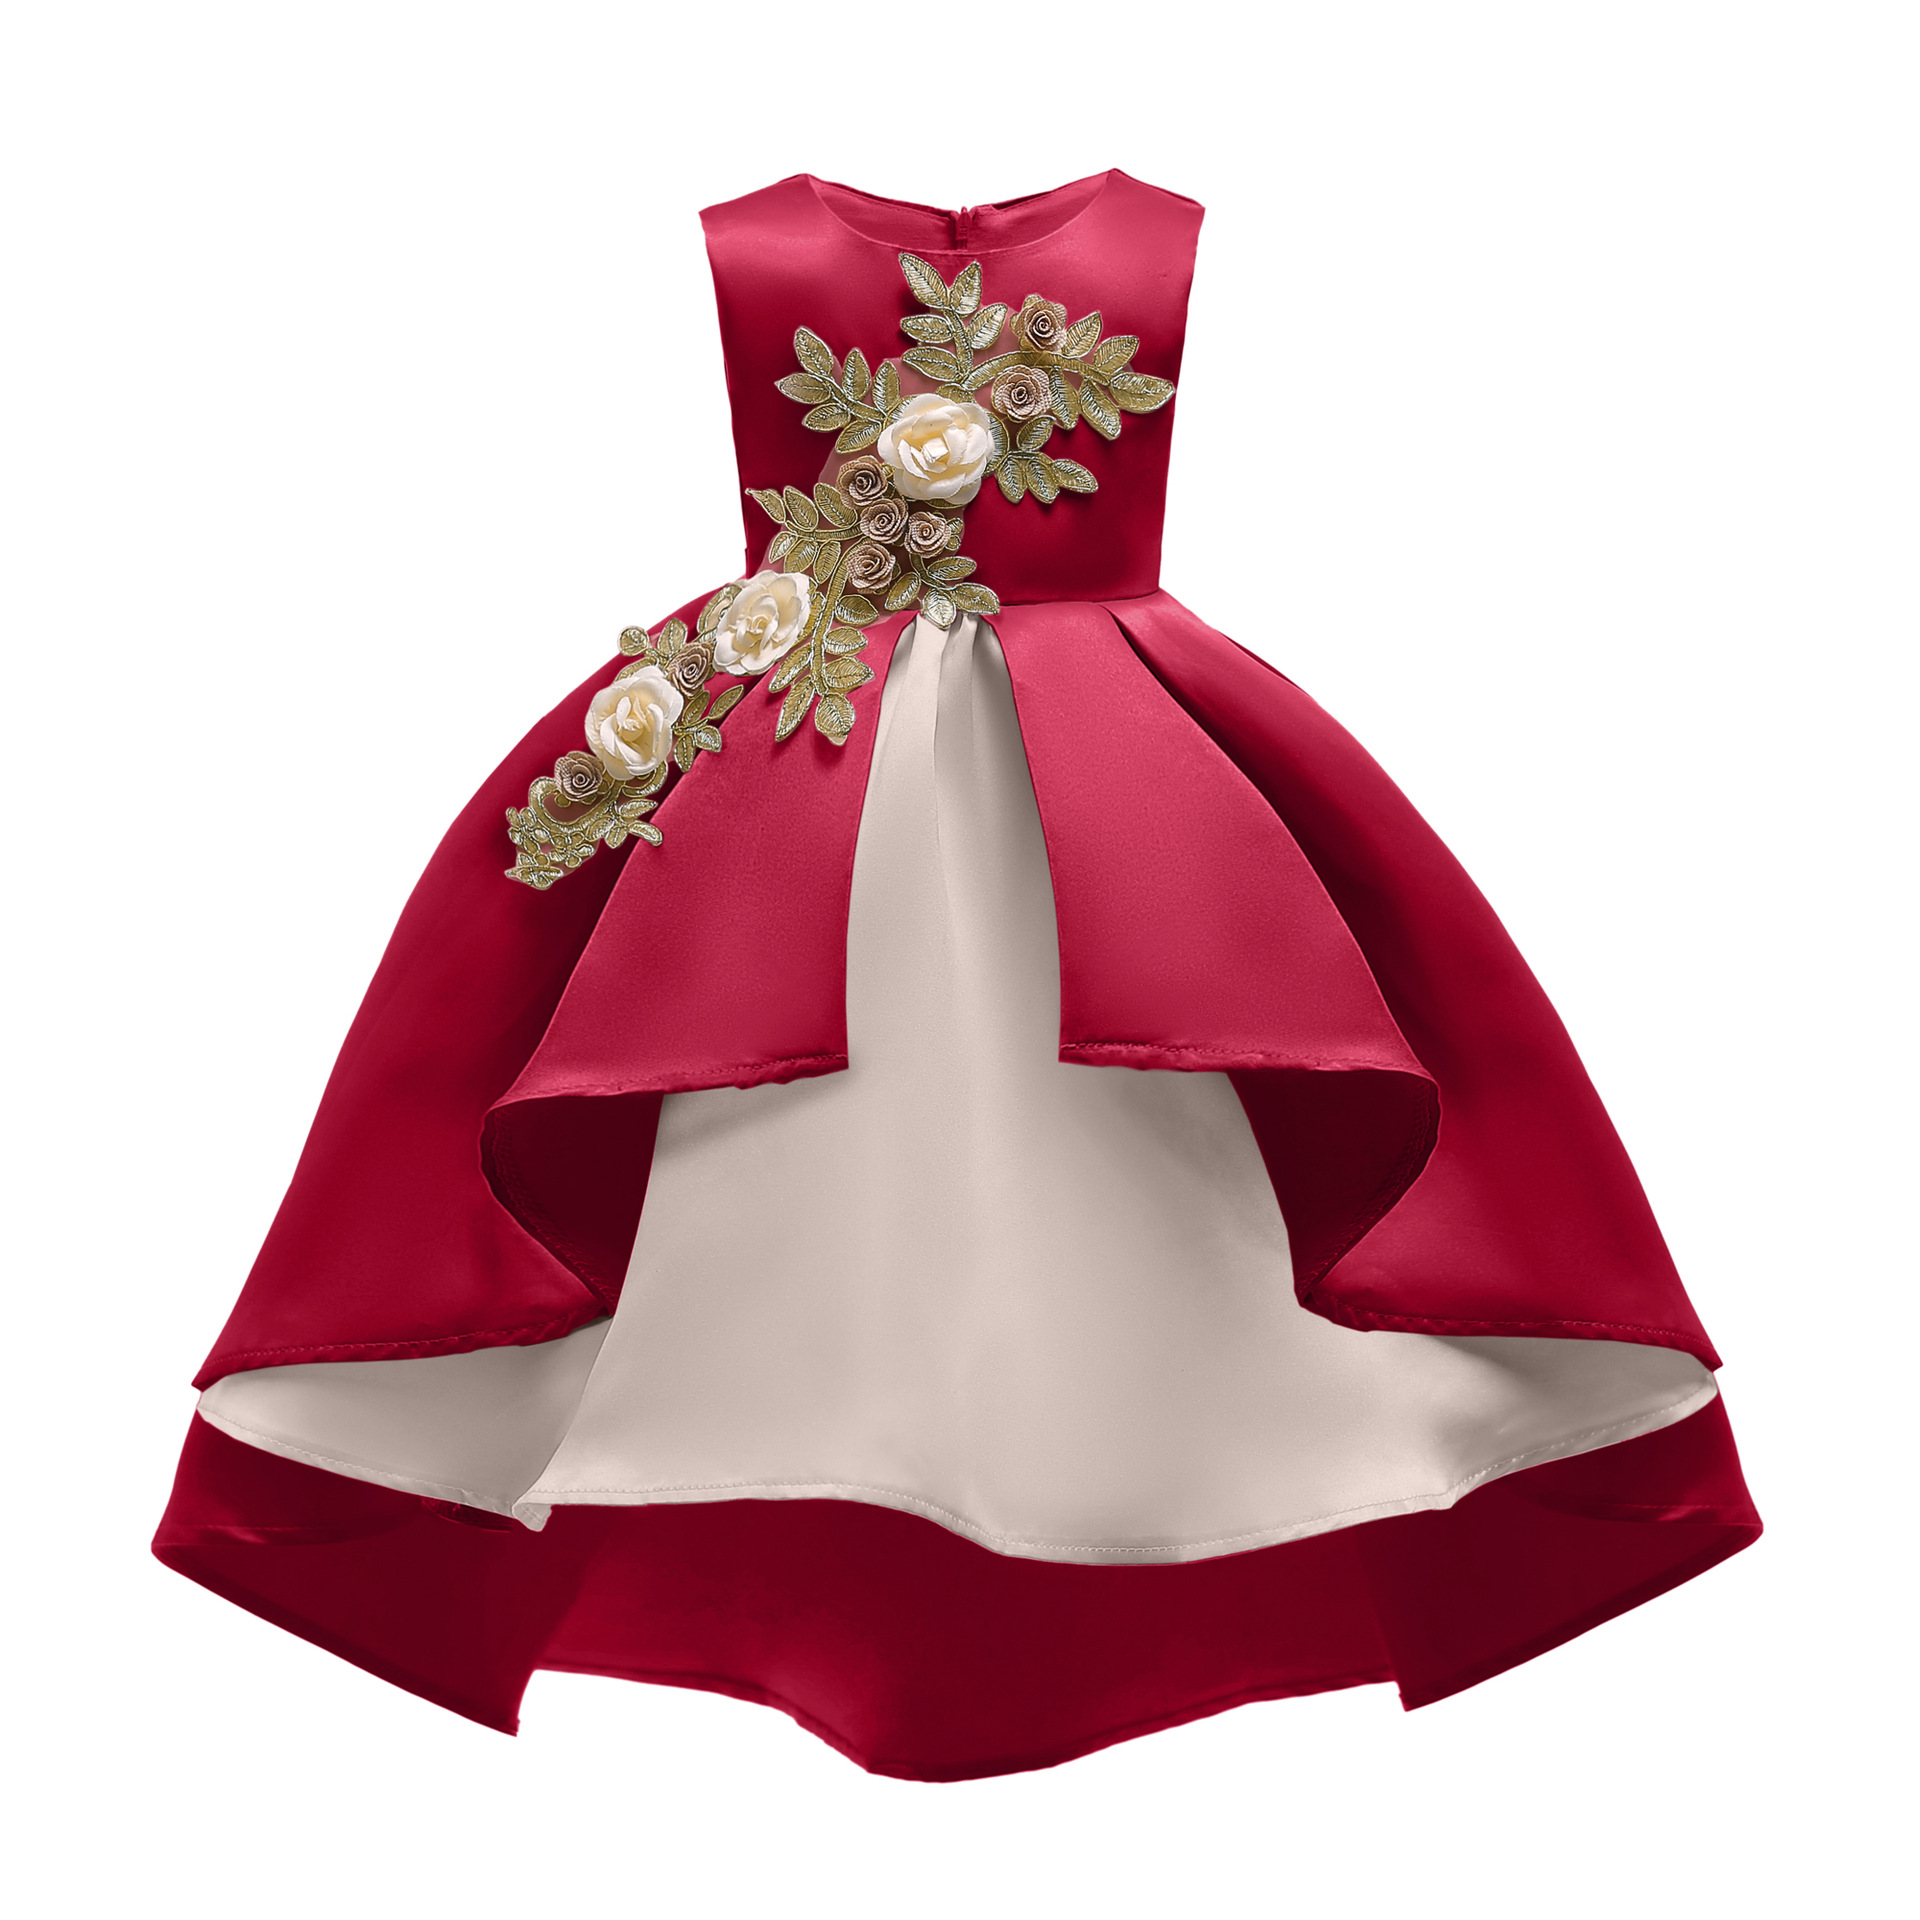 4b01929cab77a مصادر شركات تصنيع صور الطفل تصميم فستان وصور الطفل تصميم فستان في  Alibaba.com